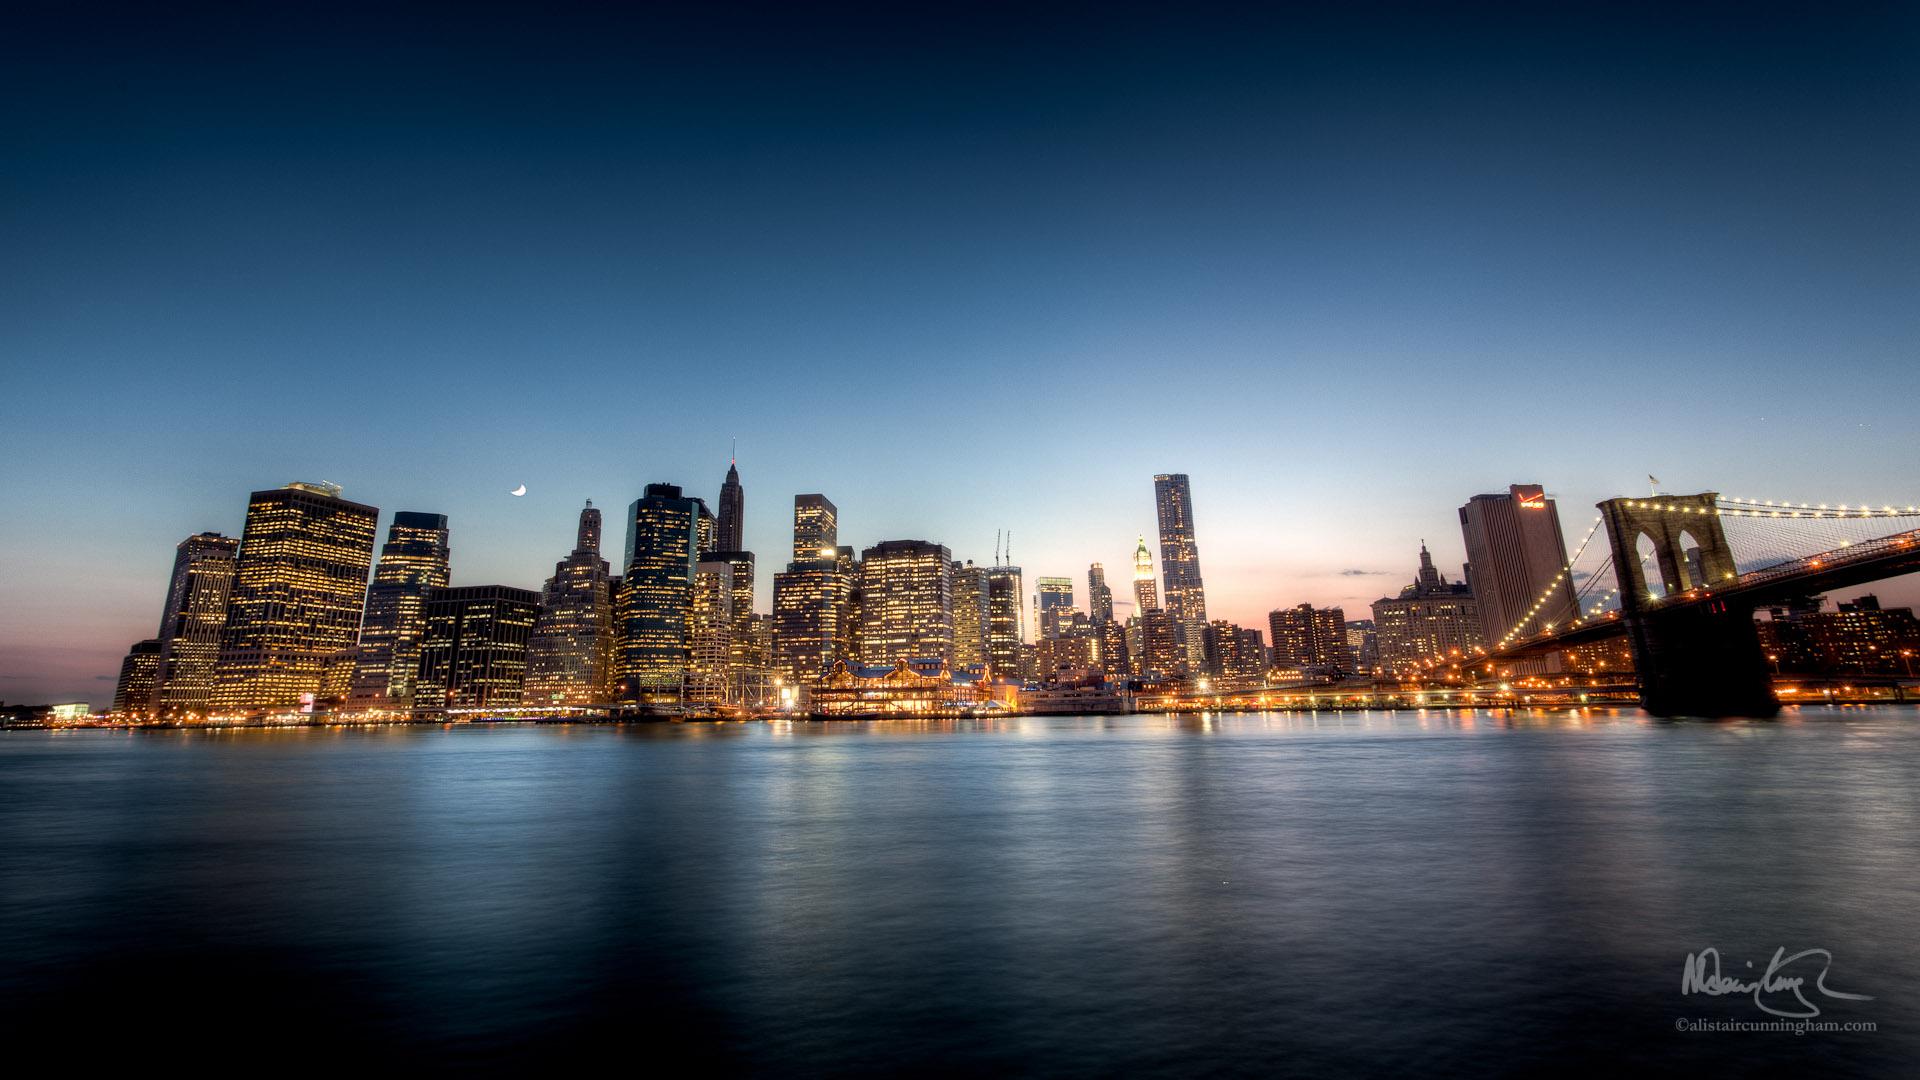 HDR Photograph of the Manhattan skyline